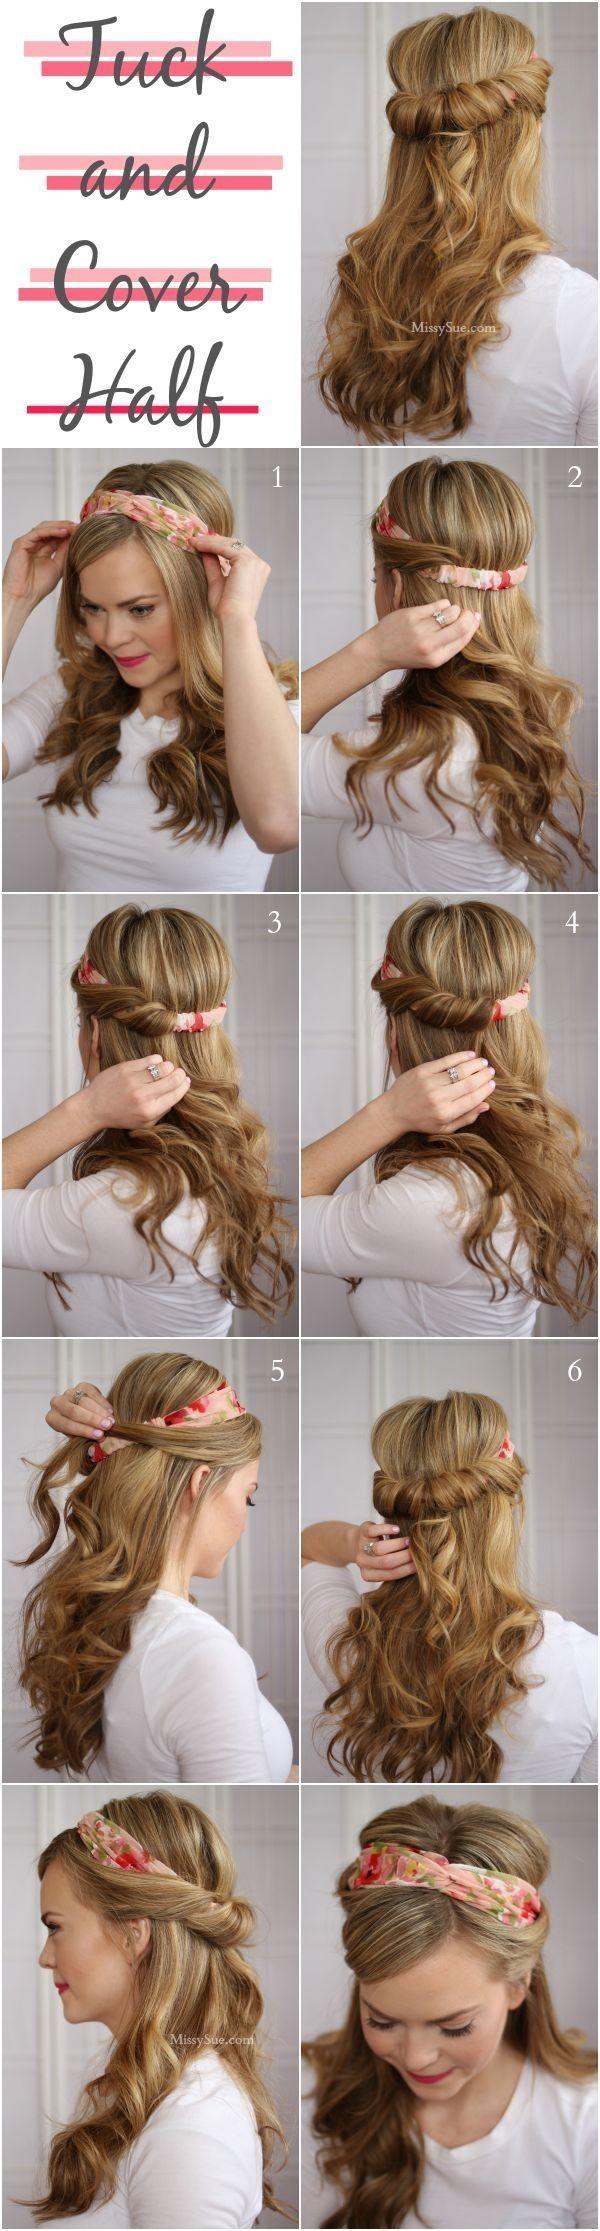 hairstyles for work hair pinterest hair hair styles and